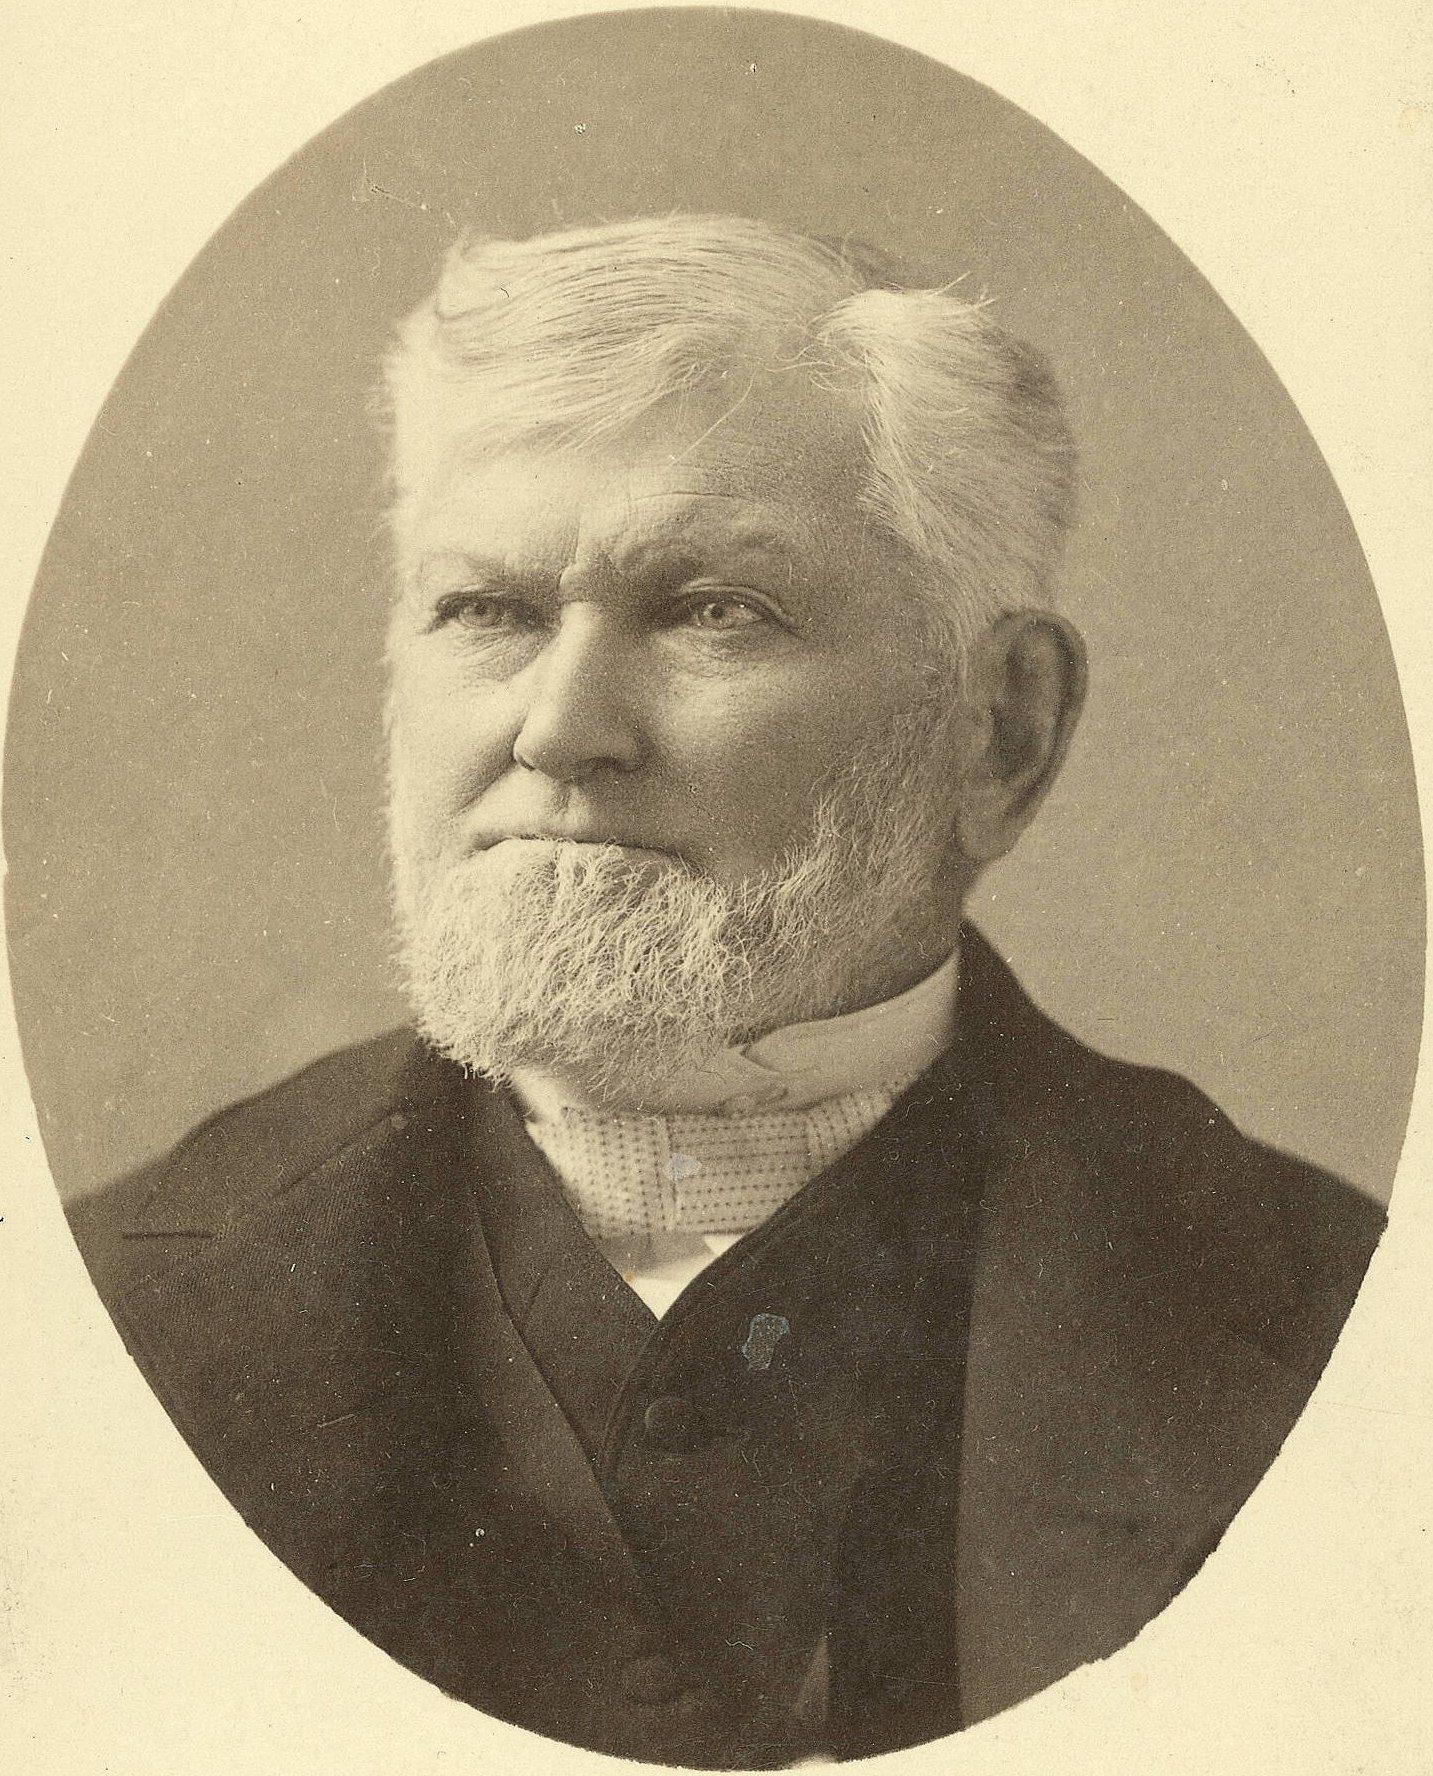 Wilford_Woodruff_1889